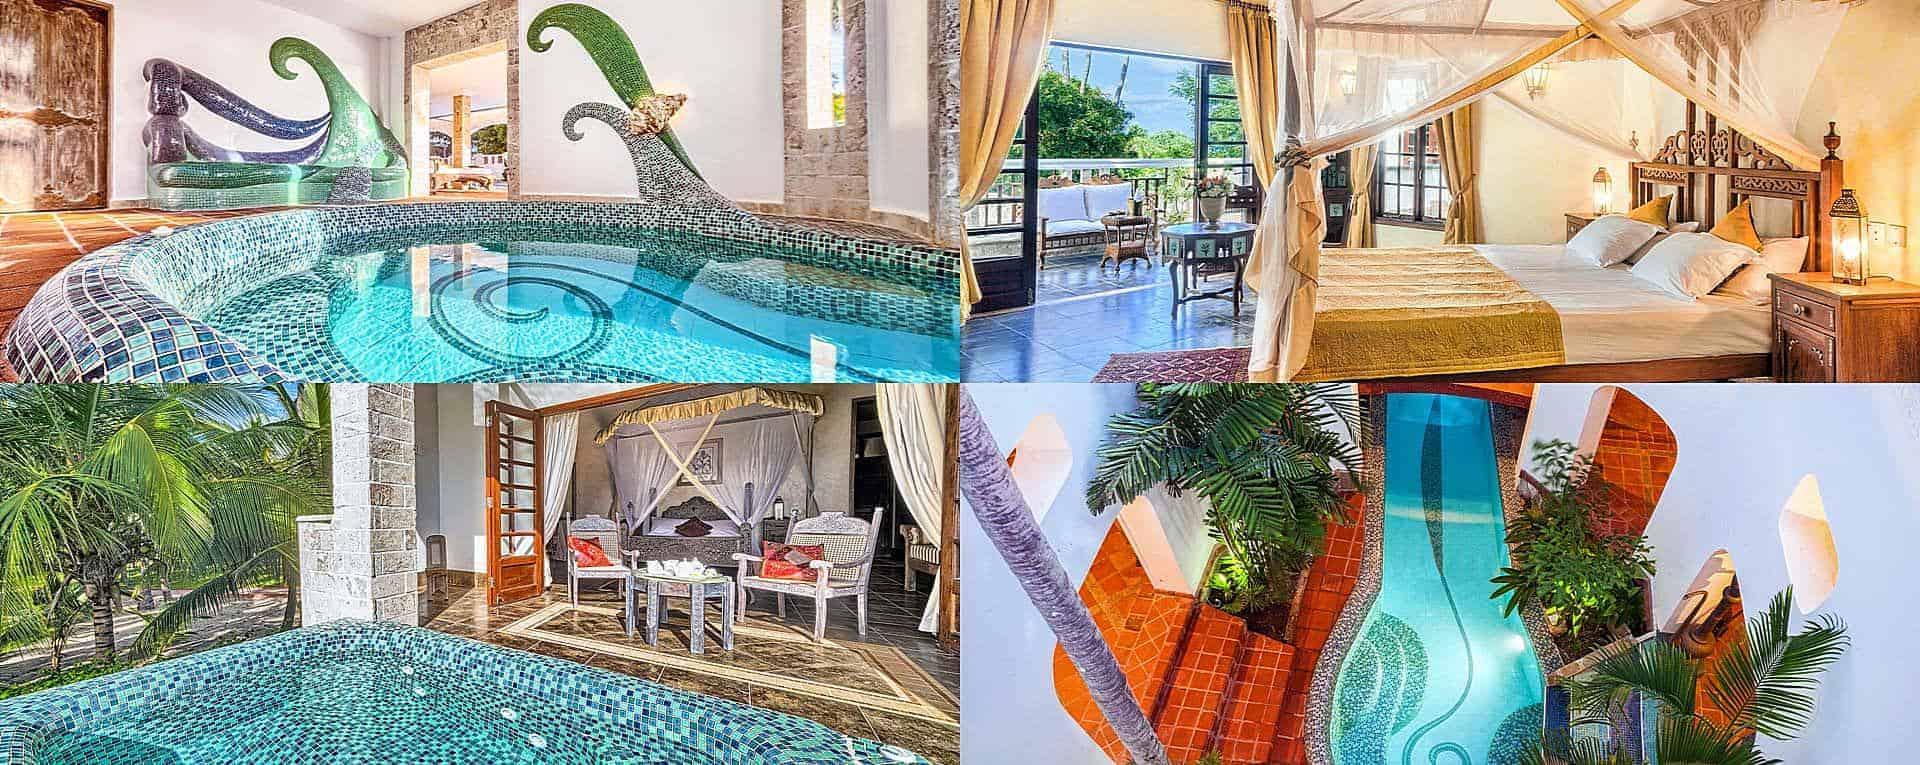 The Maji Beach Boutique Hotel - Mombasa South Beach